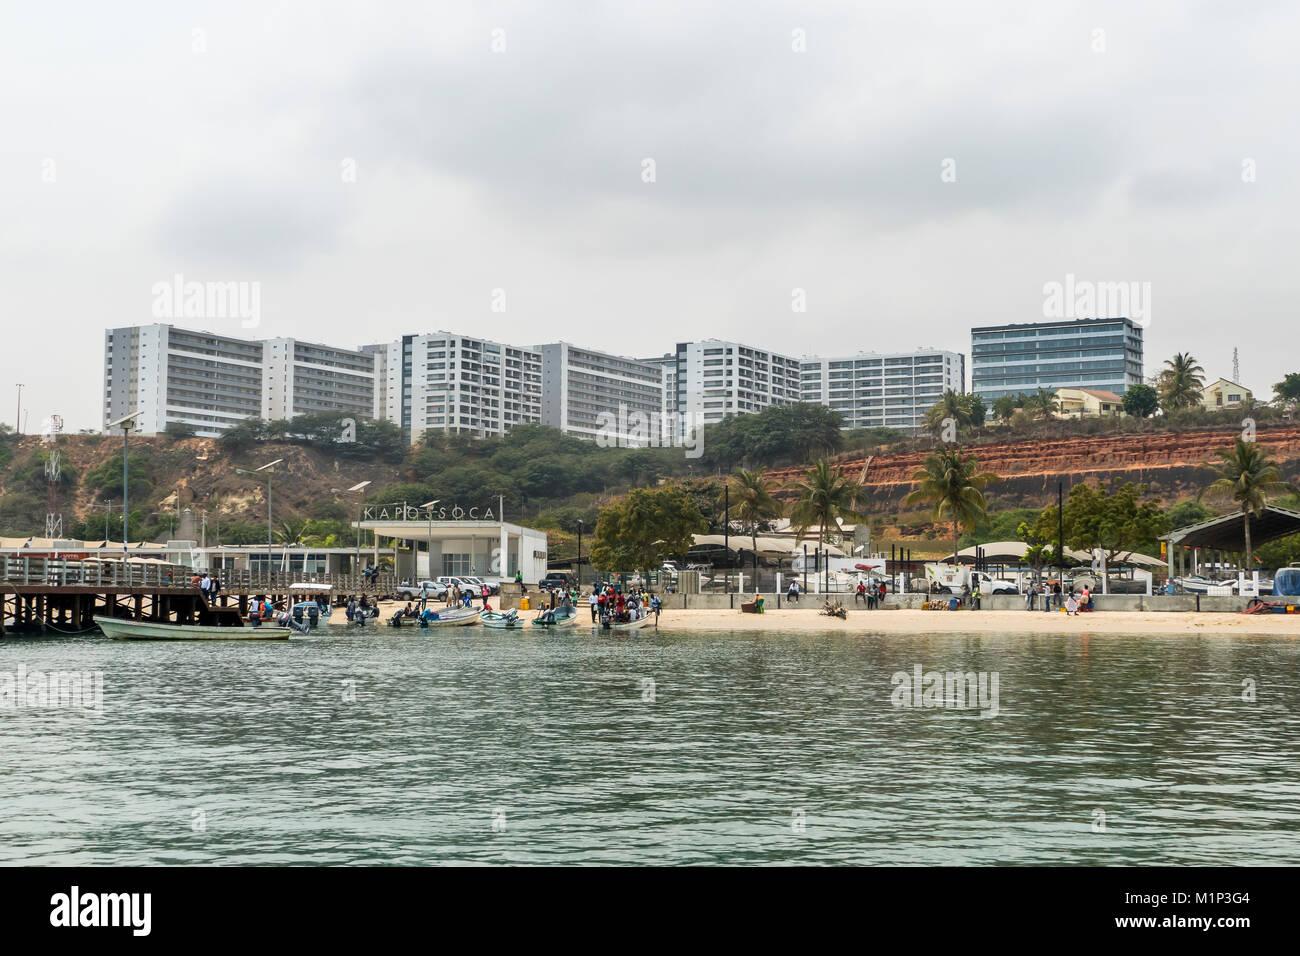 Huge apartment blocks opposite Mussulo island, Luanda, Angola, Africa - Stock Image